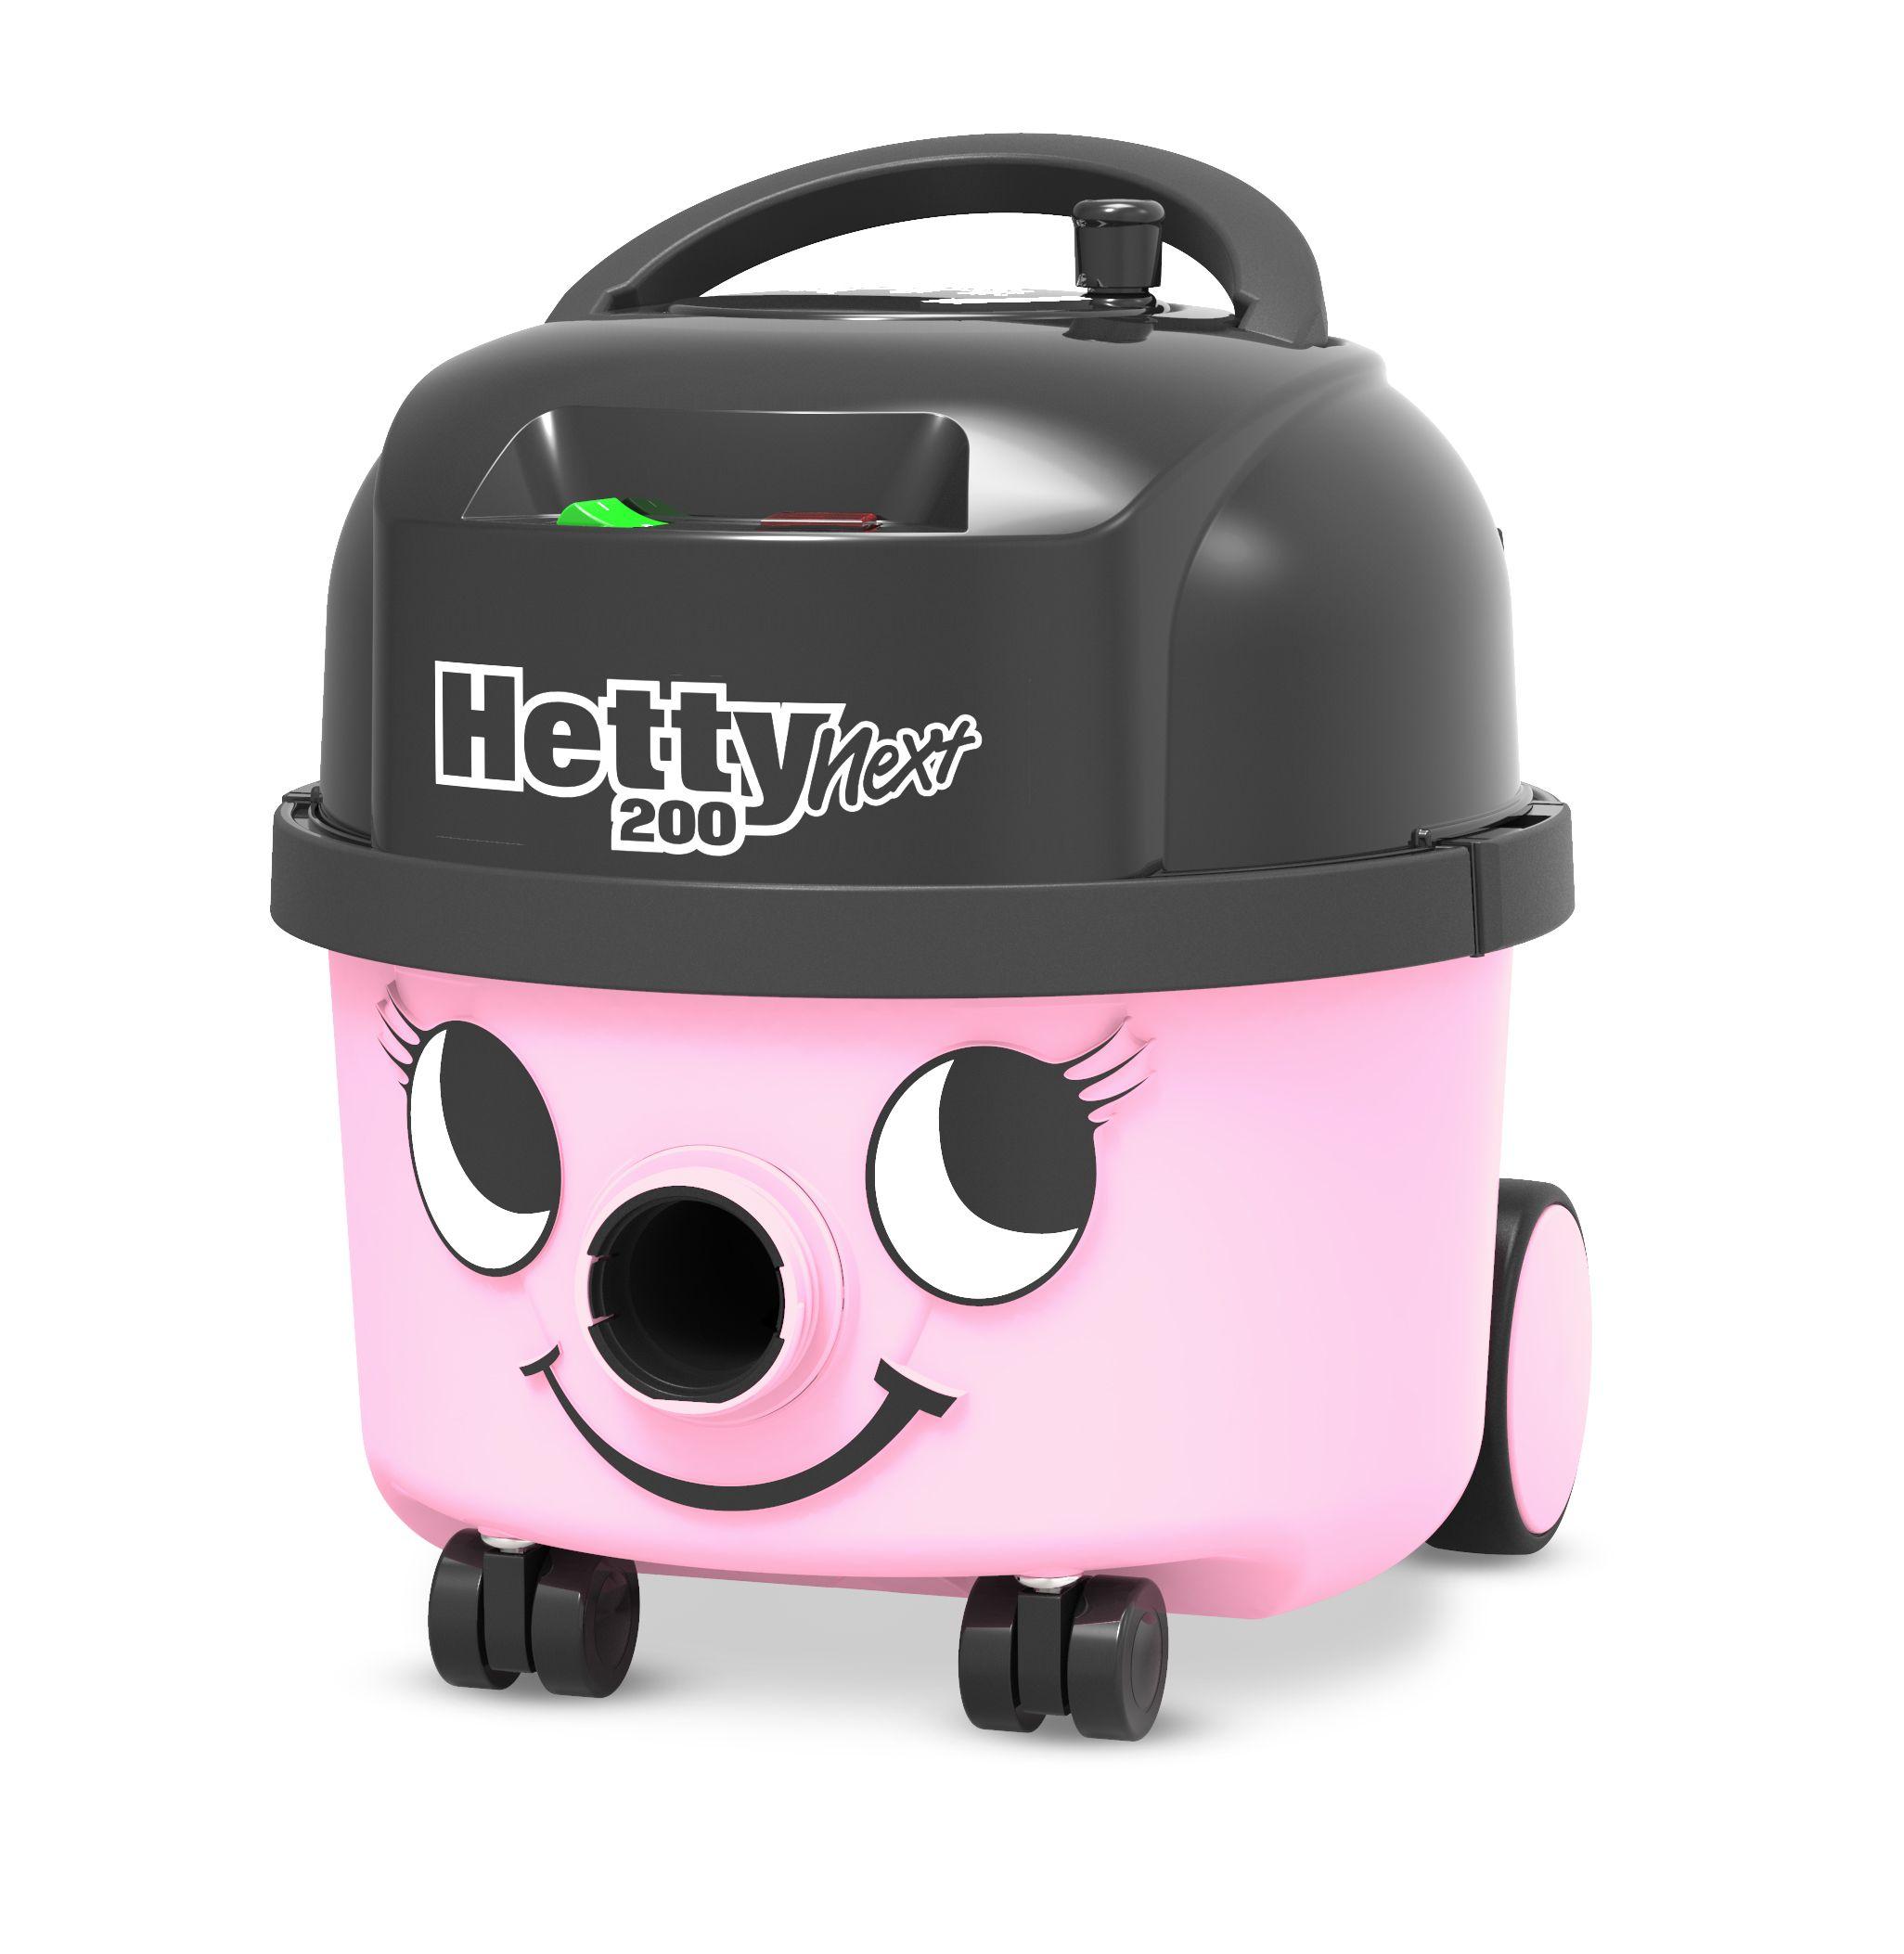 Stofzuiger Hetty Next HVN208-11 roze met kit AST0 en 601530